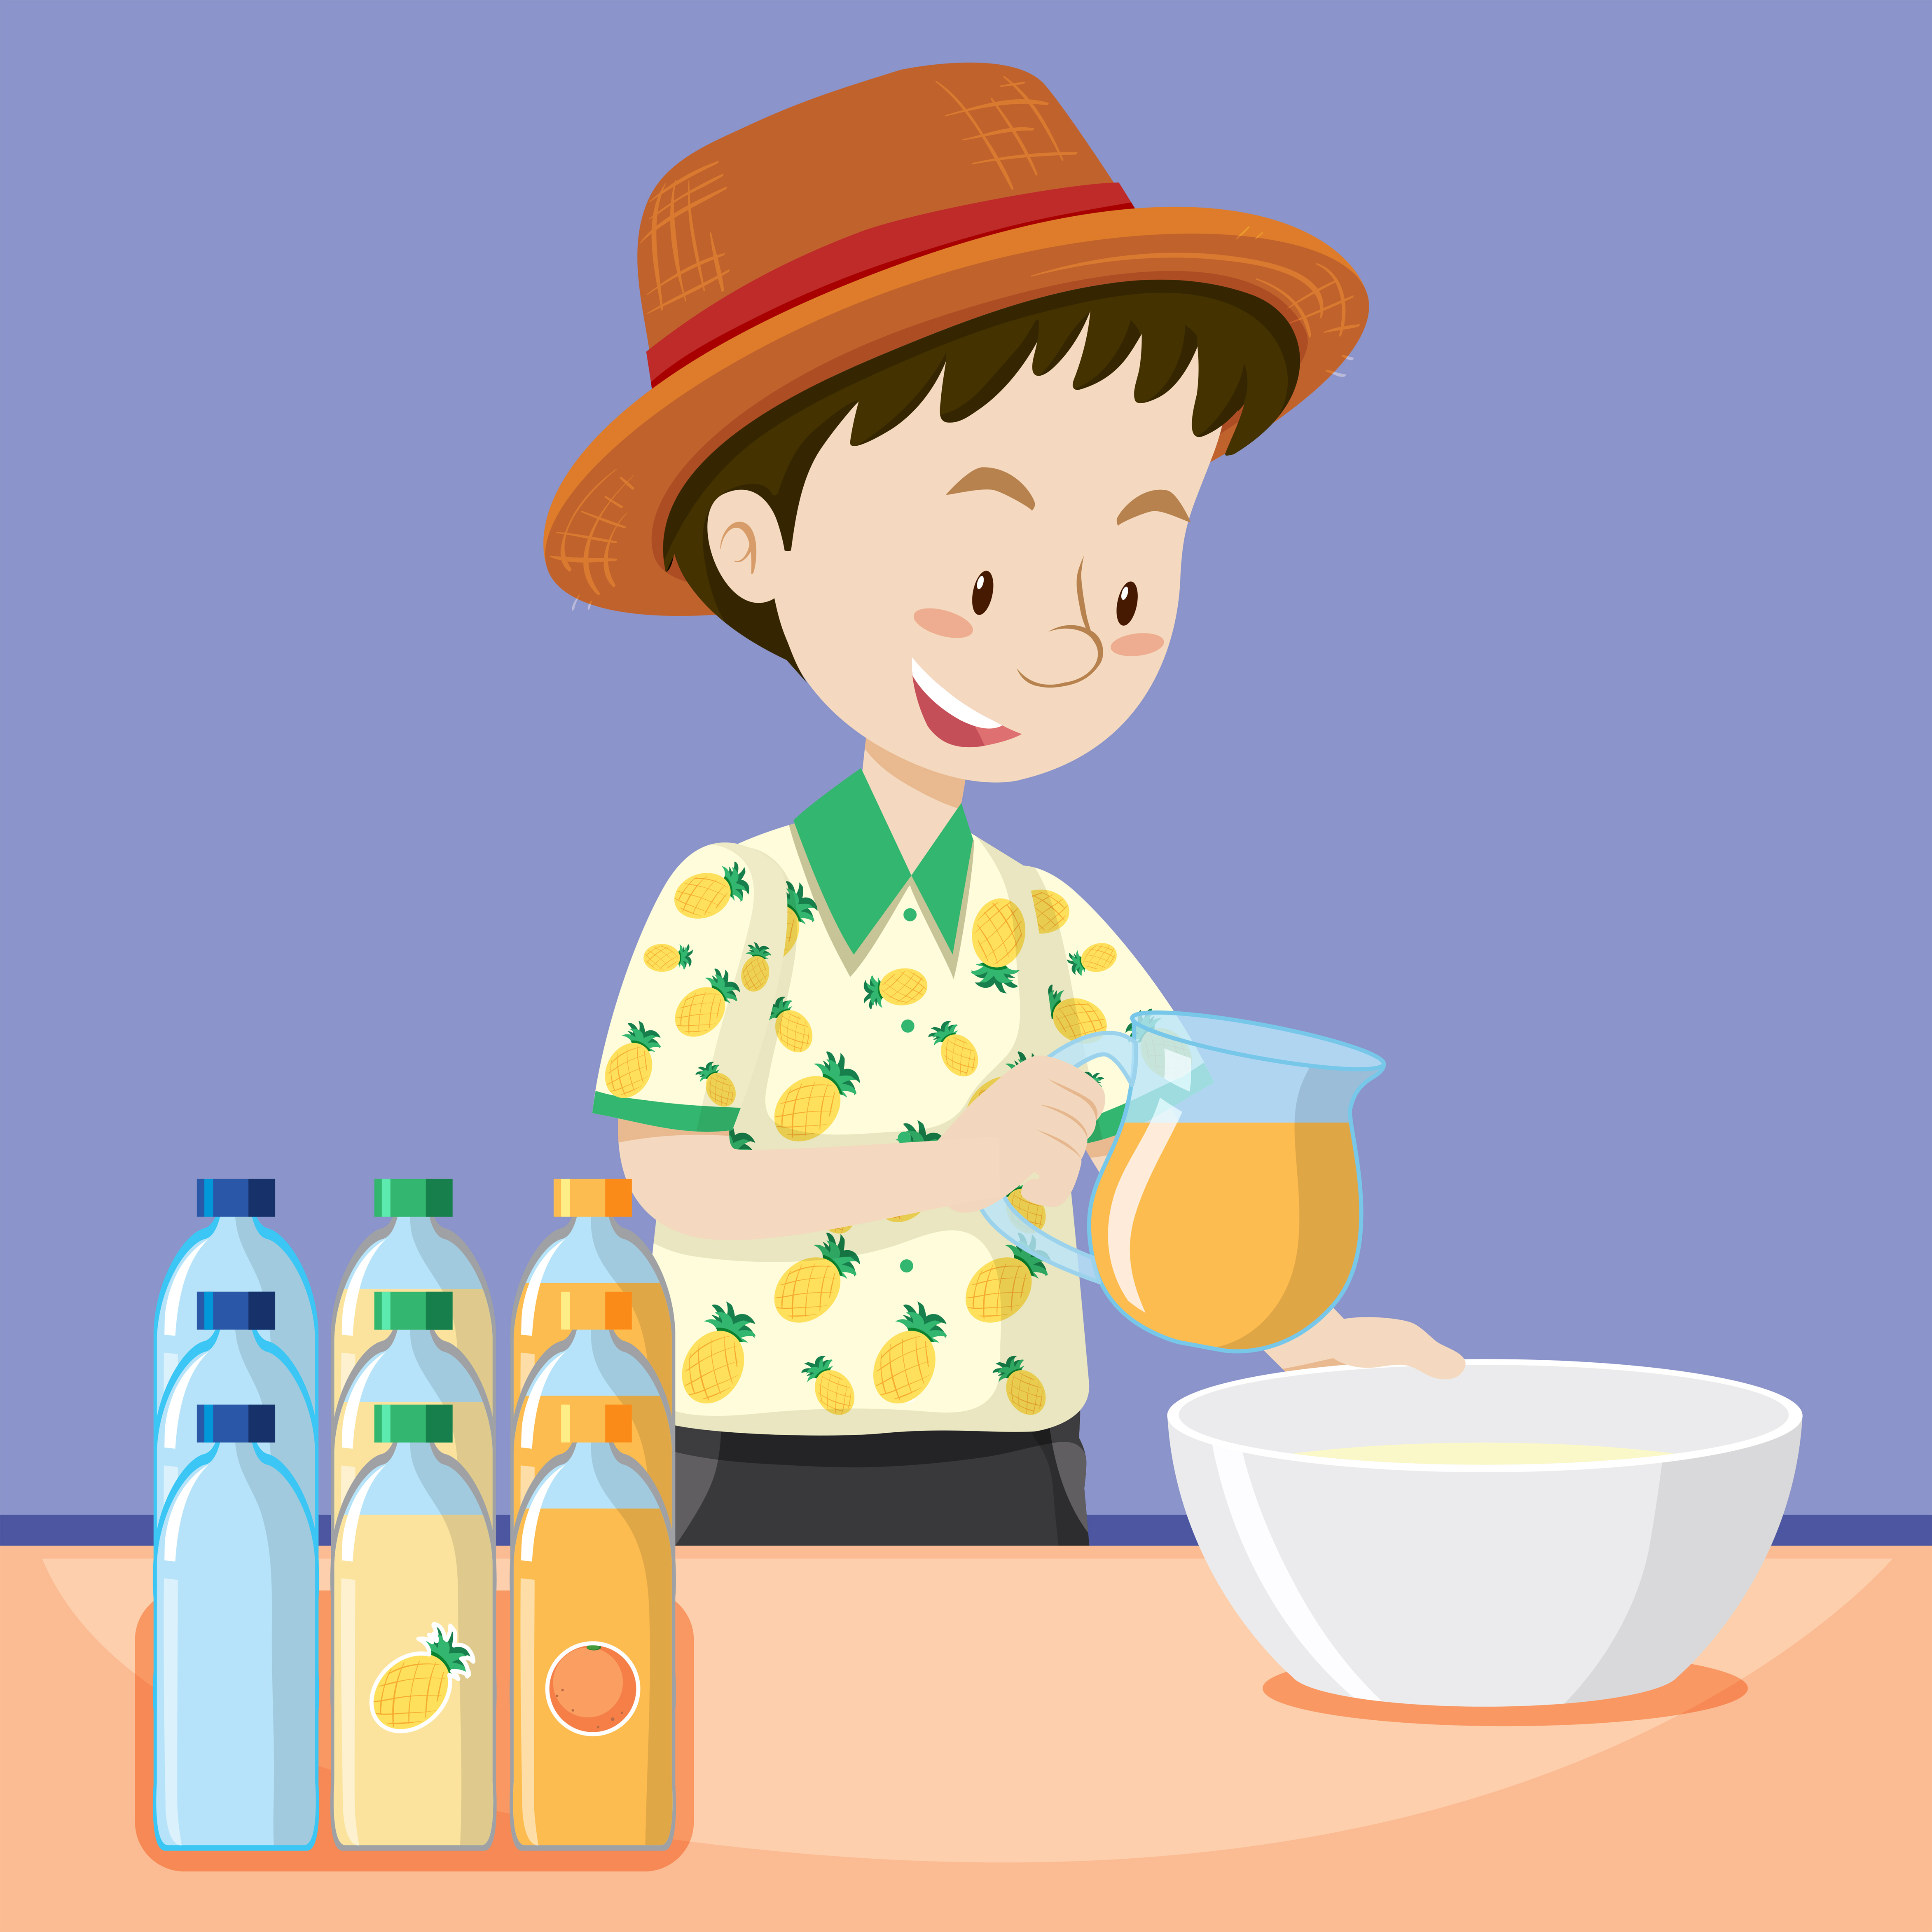 Man making fresh juice - Download Free Vectors, Clipart ...